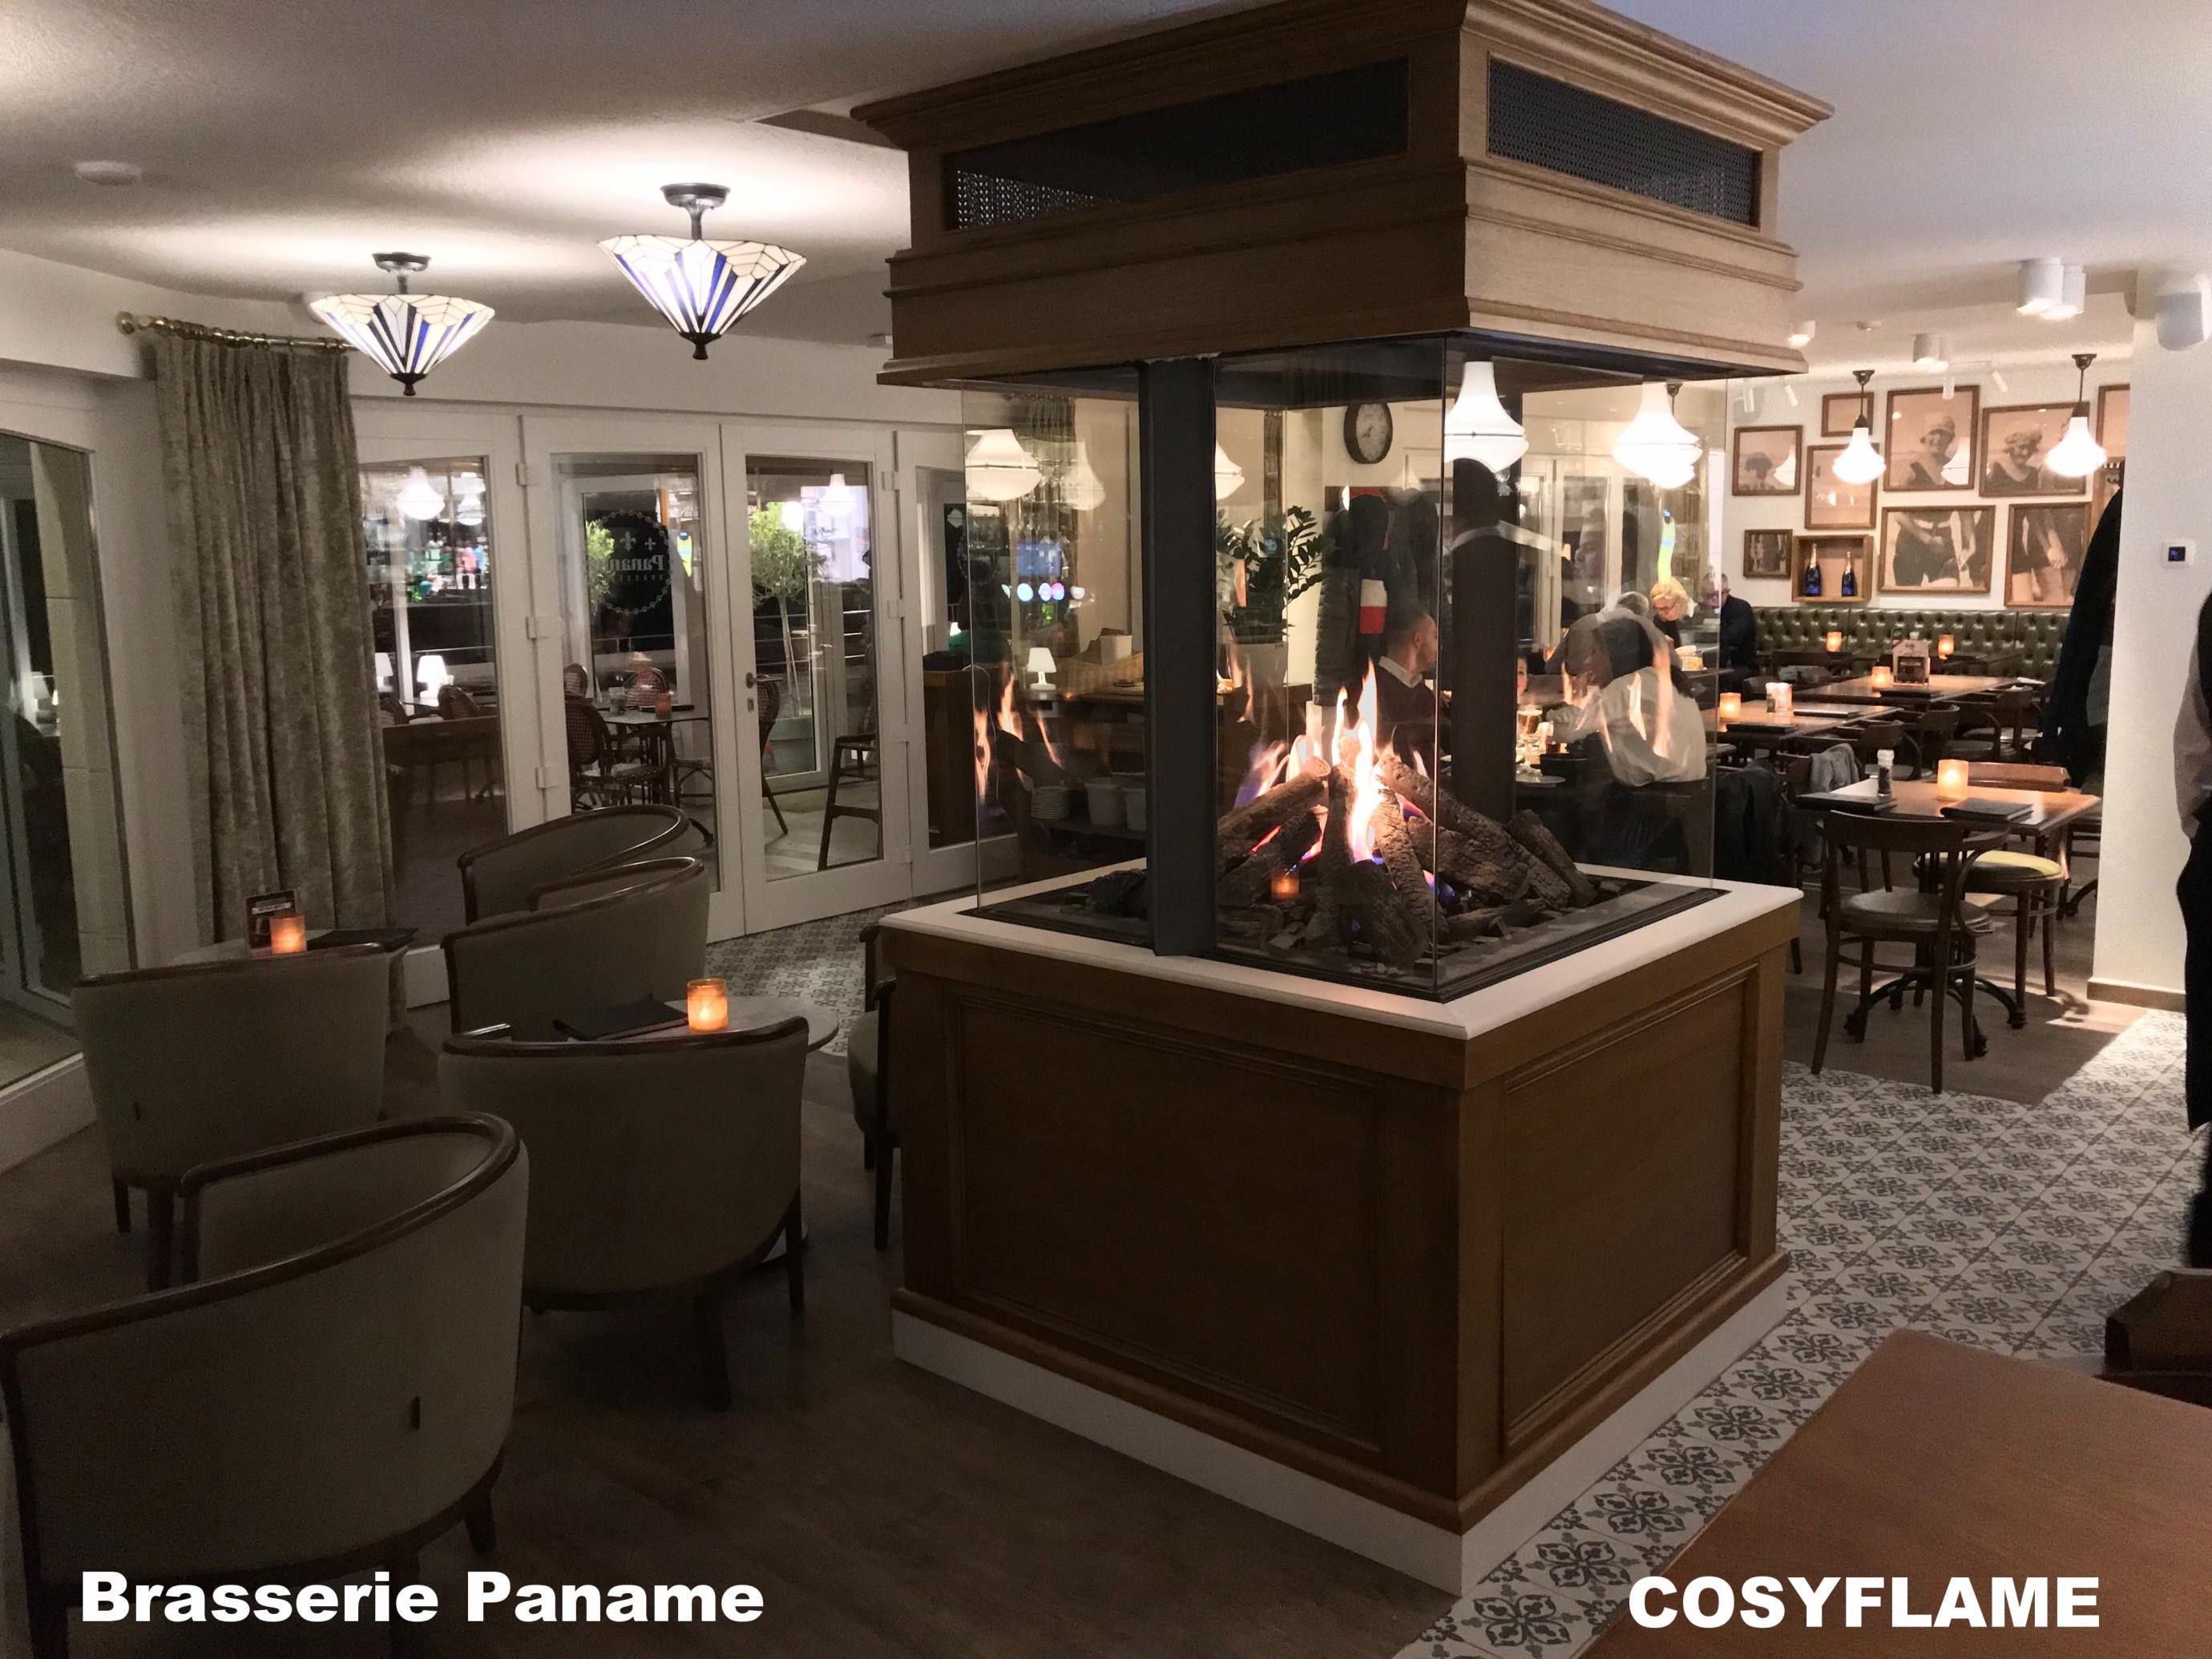 Cosyflame-Restaurants-BrasseriePaname-45.jpeg